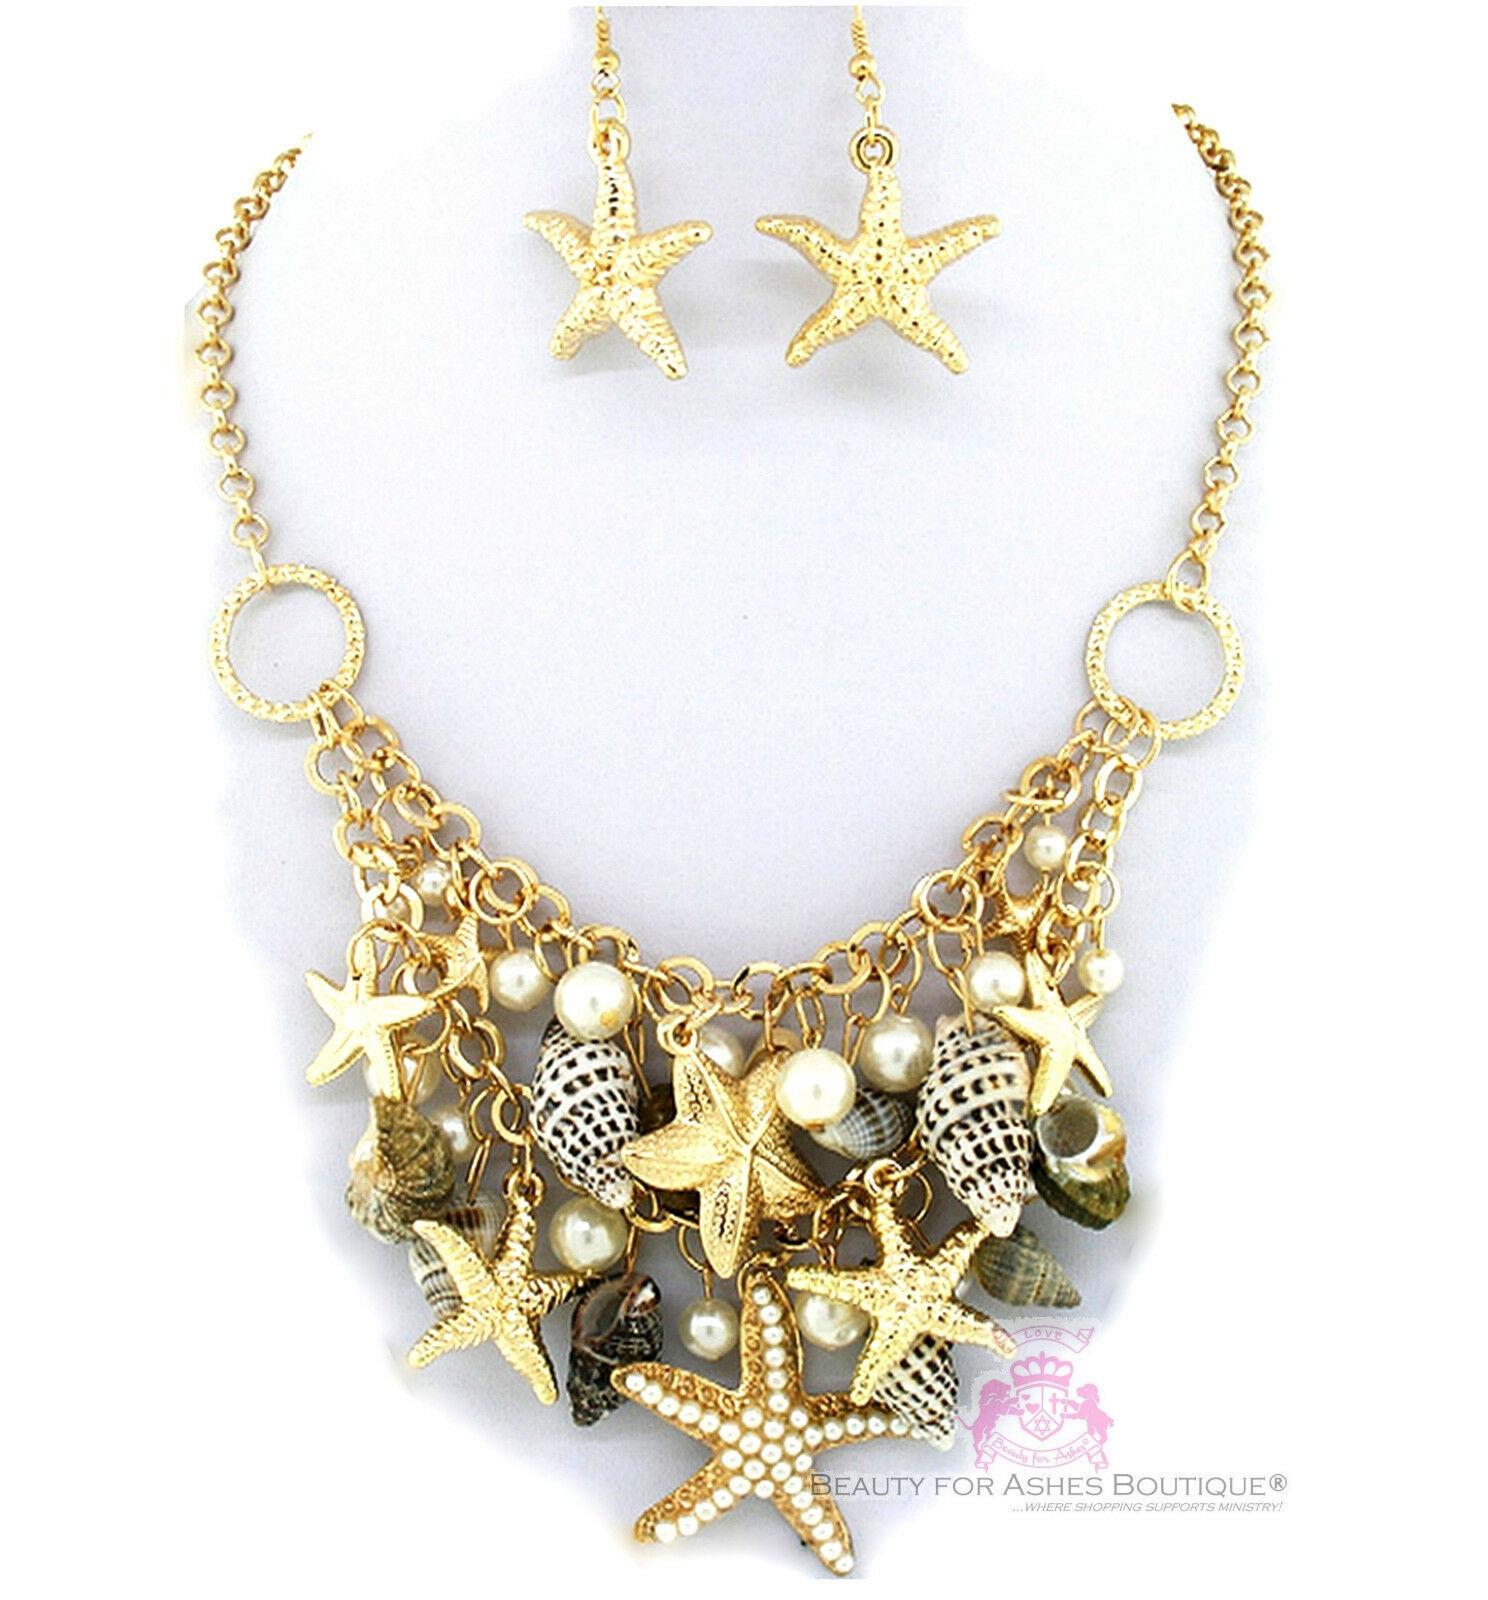 Nautical Gold Tone Bib Beach Ocean Starfish Sea Shell Chunky Charms Necklace Set - $14.97